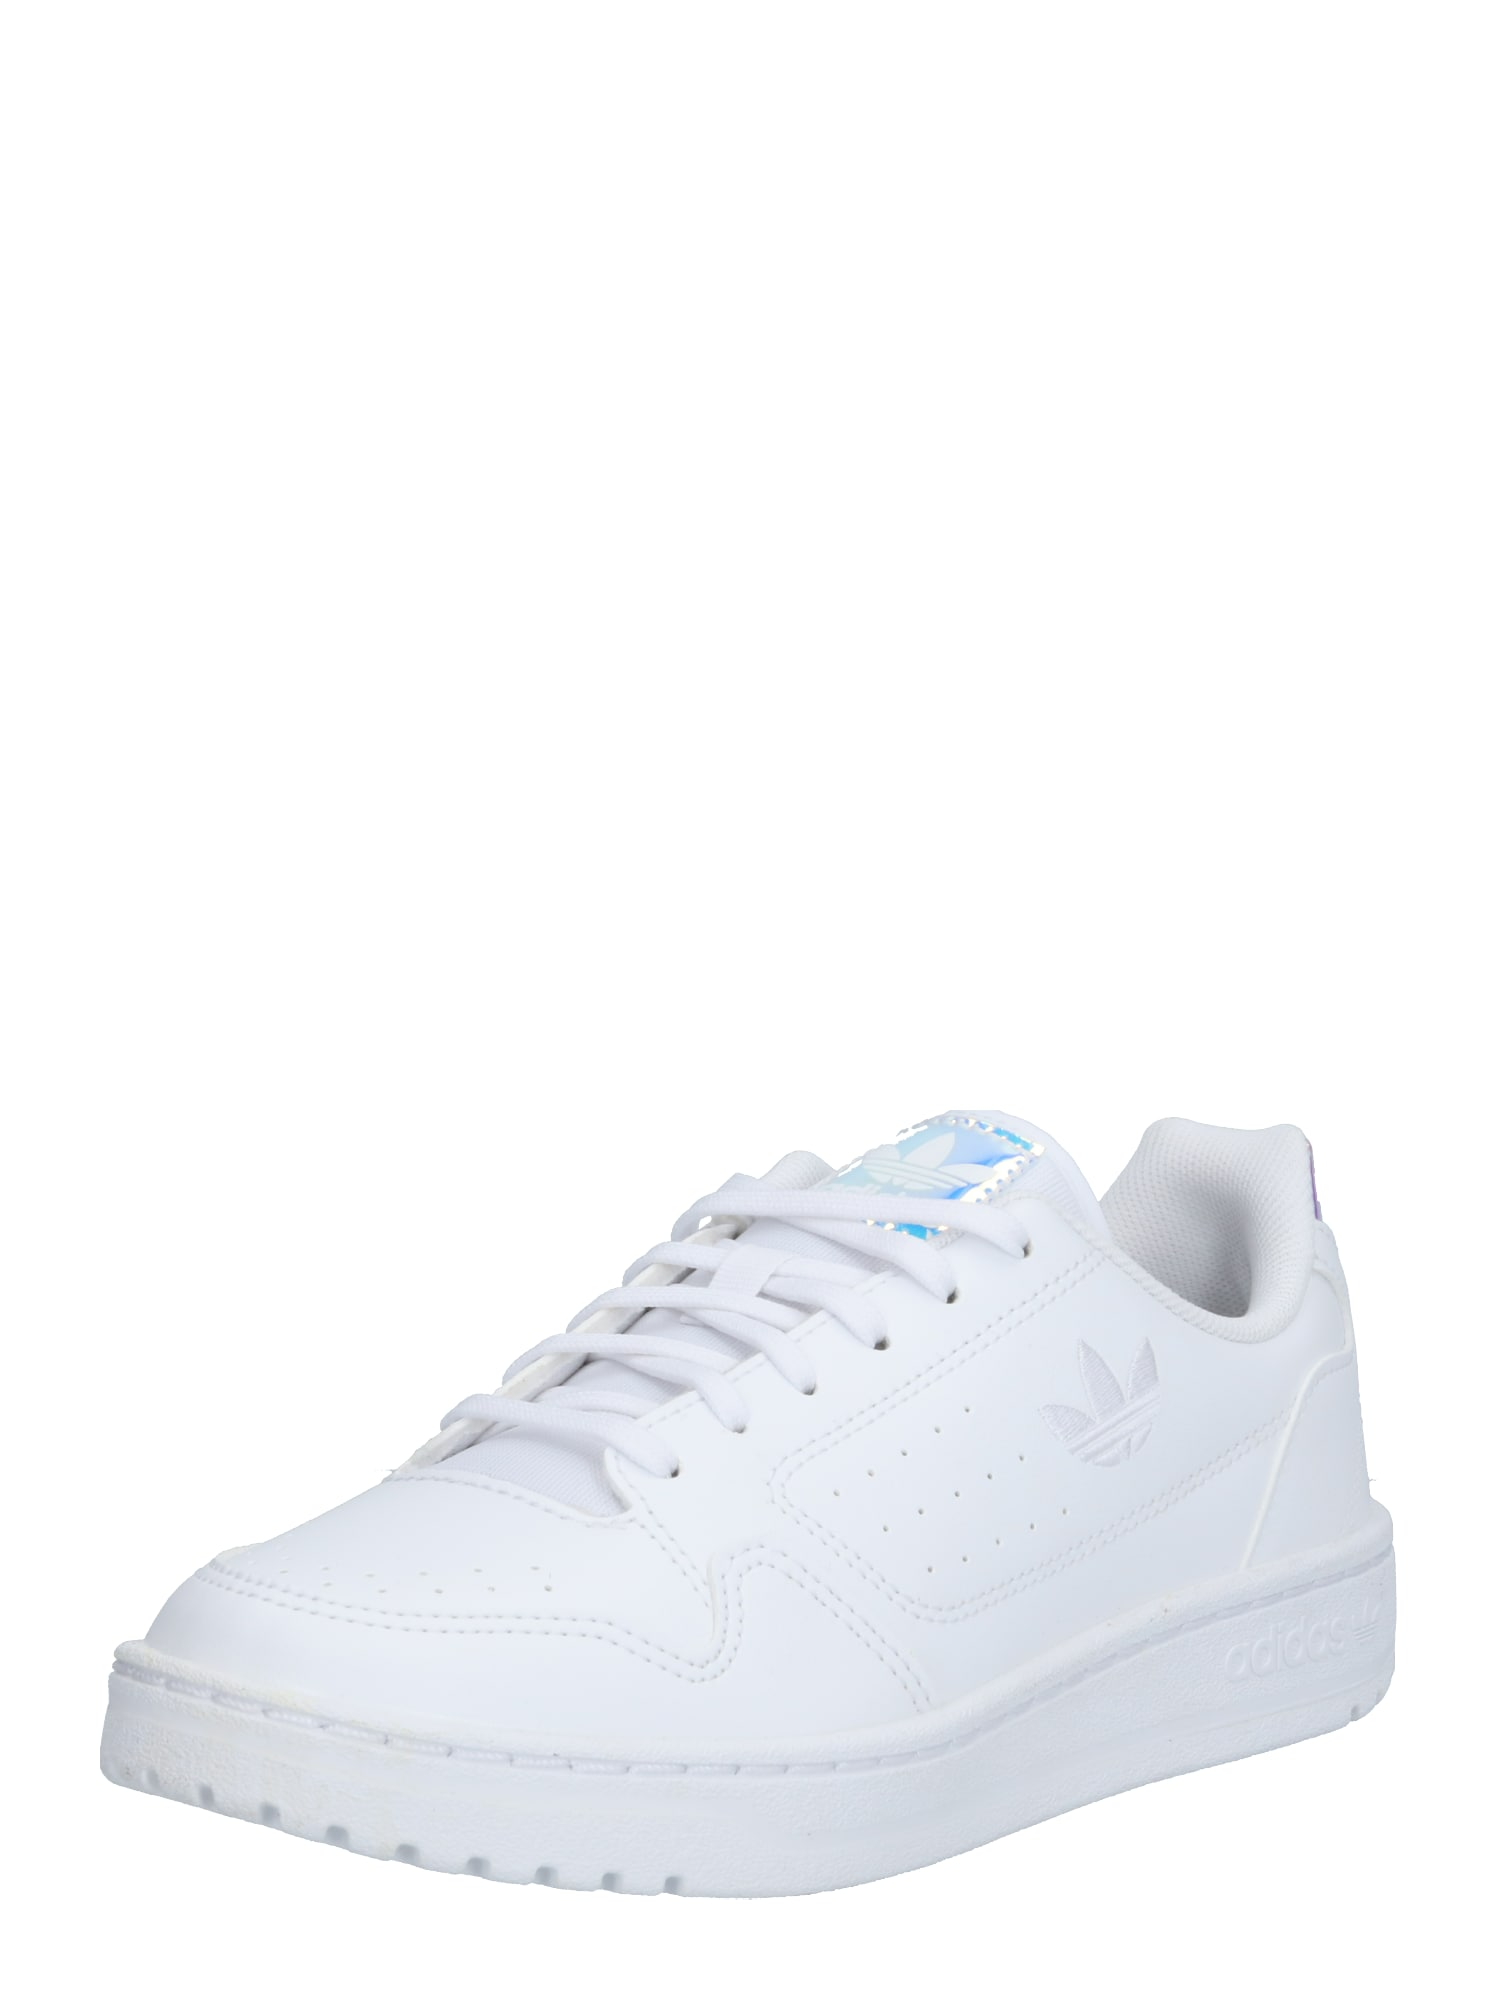 ADIDAS ORIGINALS Sportbačiai balta / mišrios spalvos